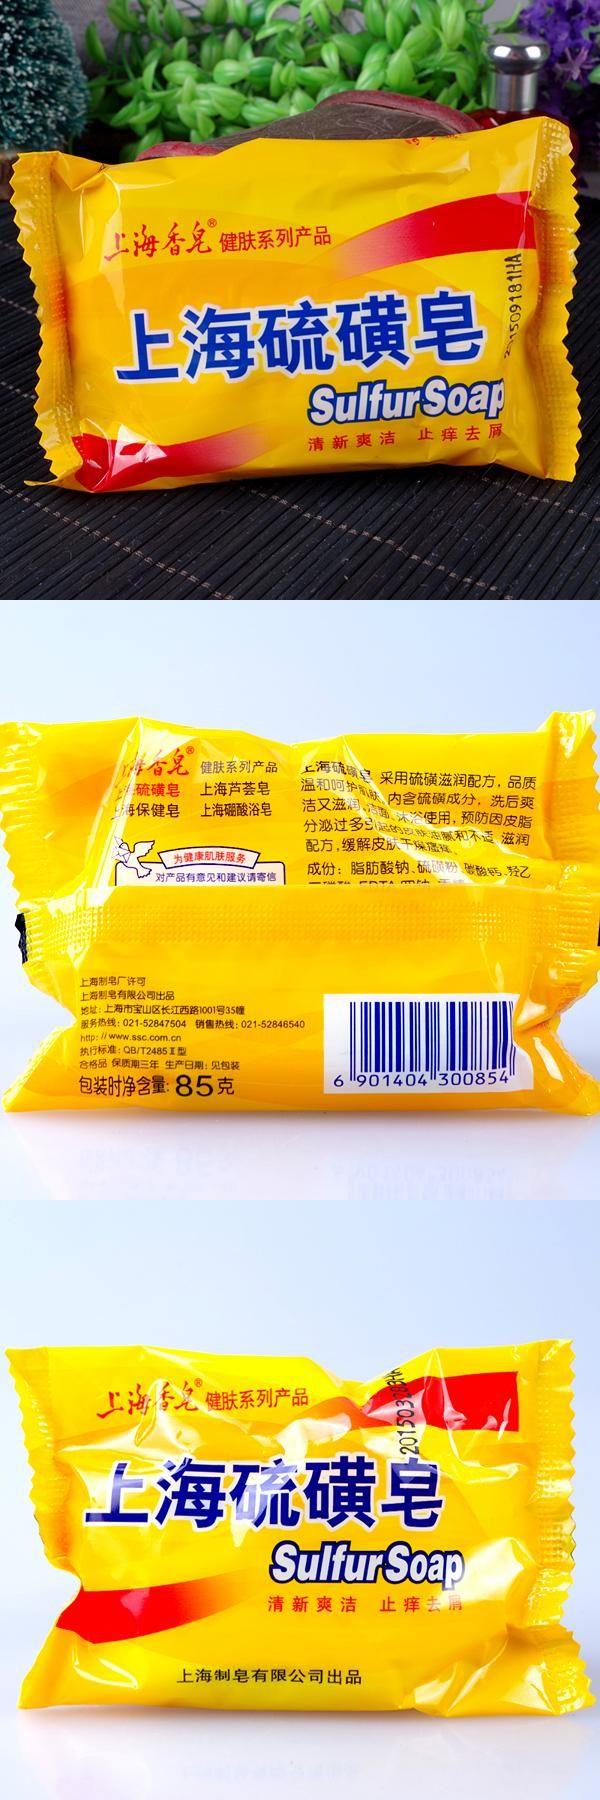 [Visit to Buy] Shanghai Sulfur Soap 4 Skin Conditions Acne Psoriasis Seborrhea Eczema Anti Fungus Perfume Butter Bubble Bath Healthy Soaps #Advertisement